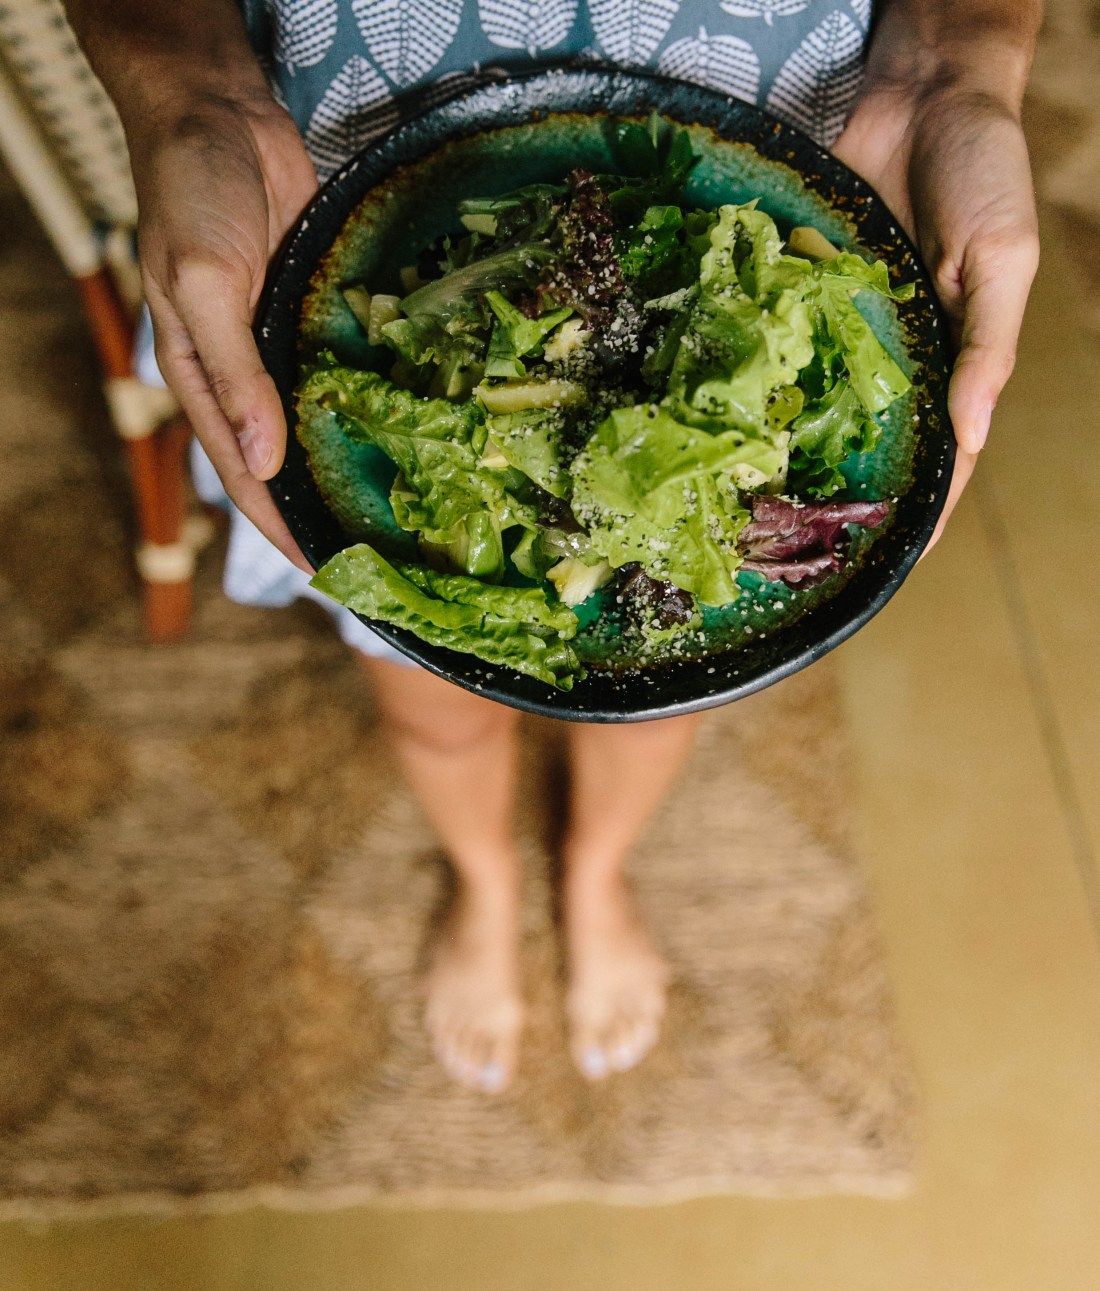 Kauai Bed + Breakfast | Places to Stay in Kauai | The Palmwood | A Curated Lodging Experience | Travel Blogger's Travel Guide to Kauai via @ elanaloo + elanaloo.com